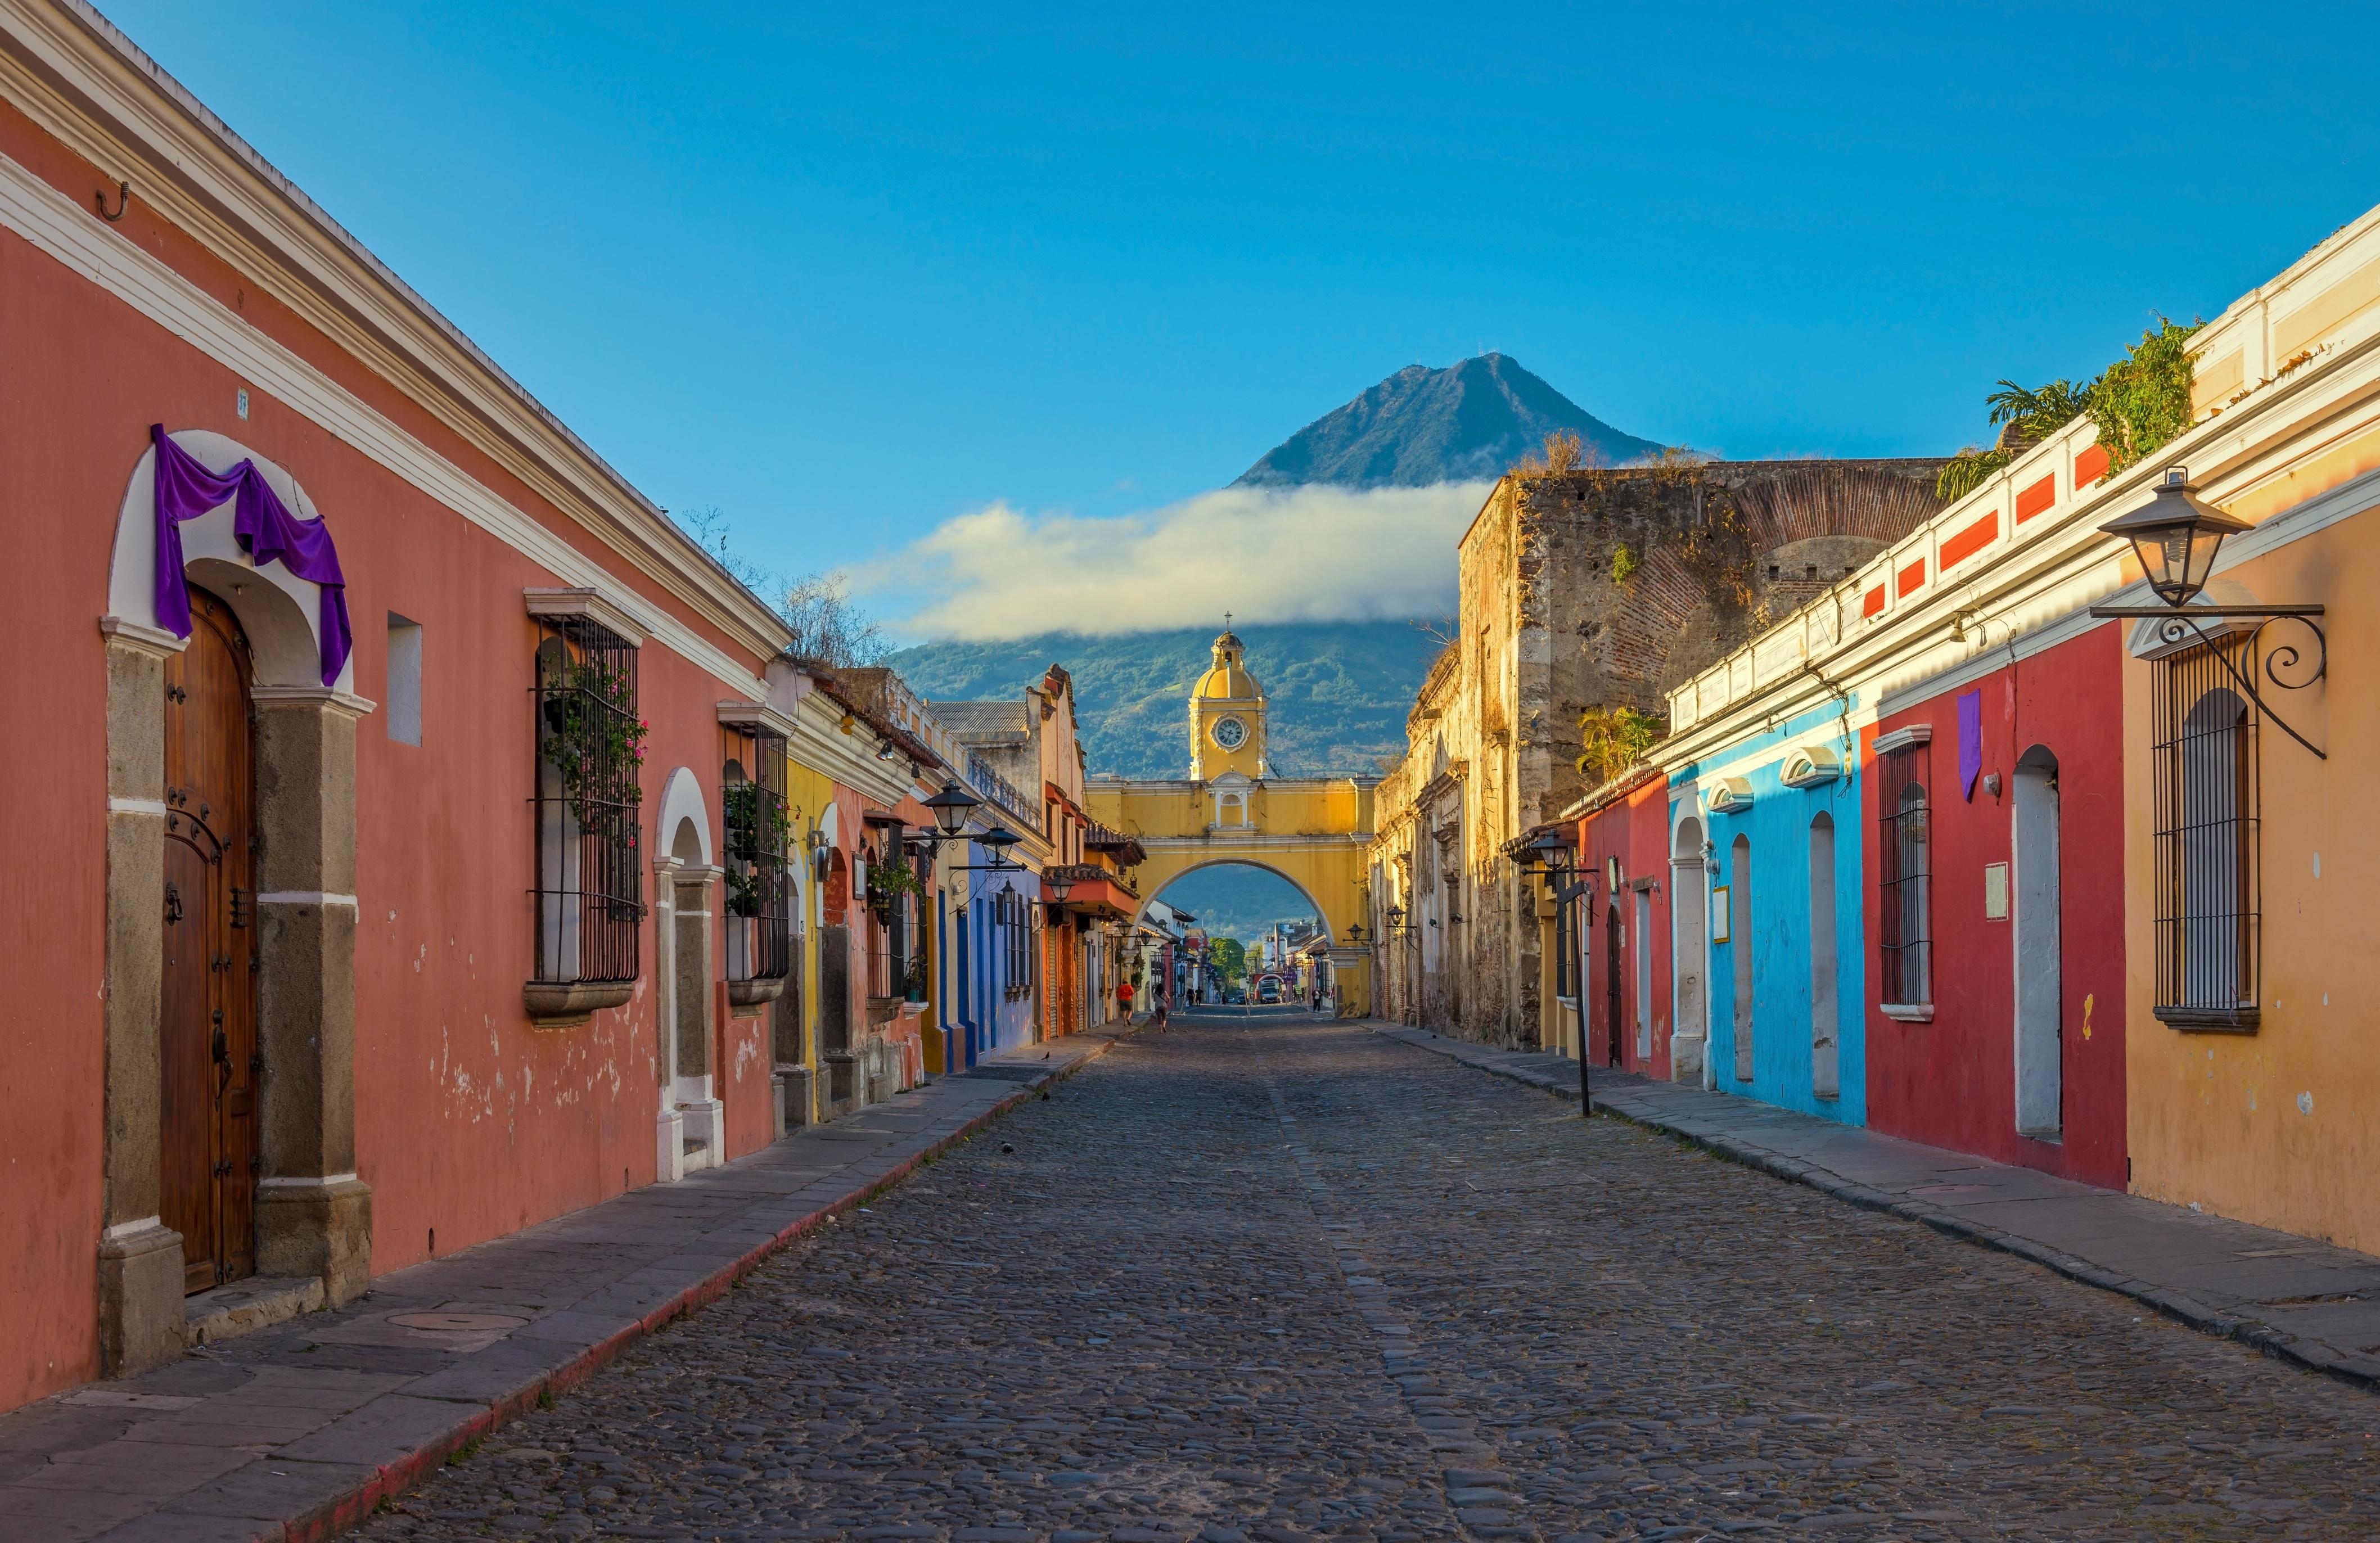 Nom : Antigua PVT Guatemala.jpg Affichages : 168 Taille : 3,38 Mo